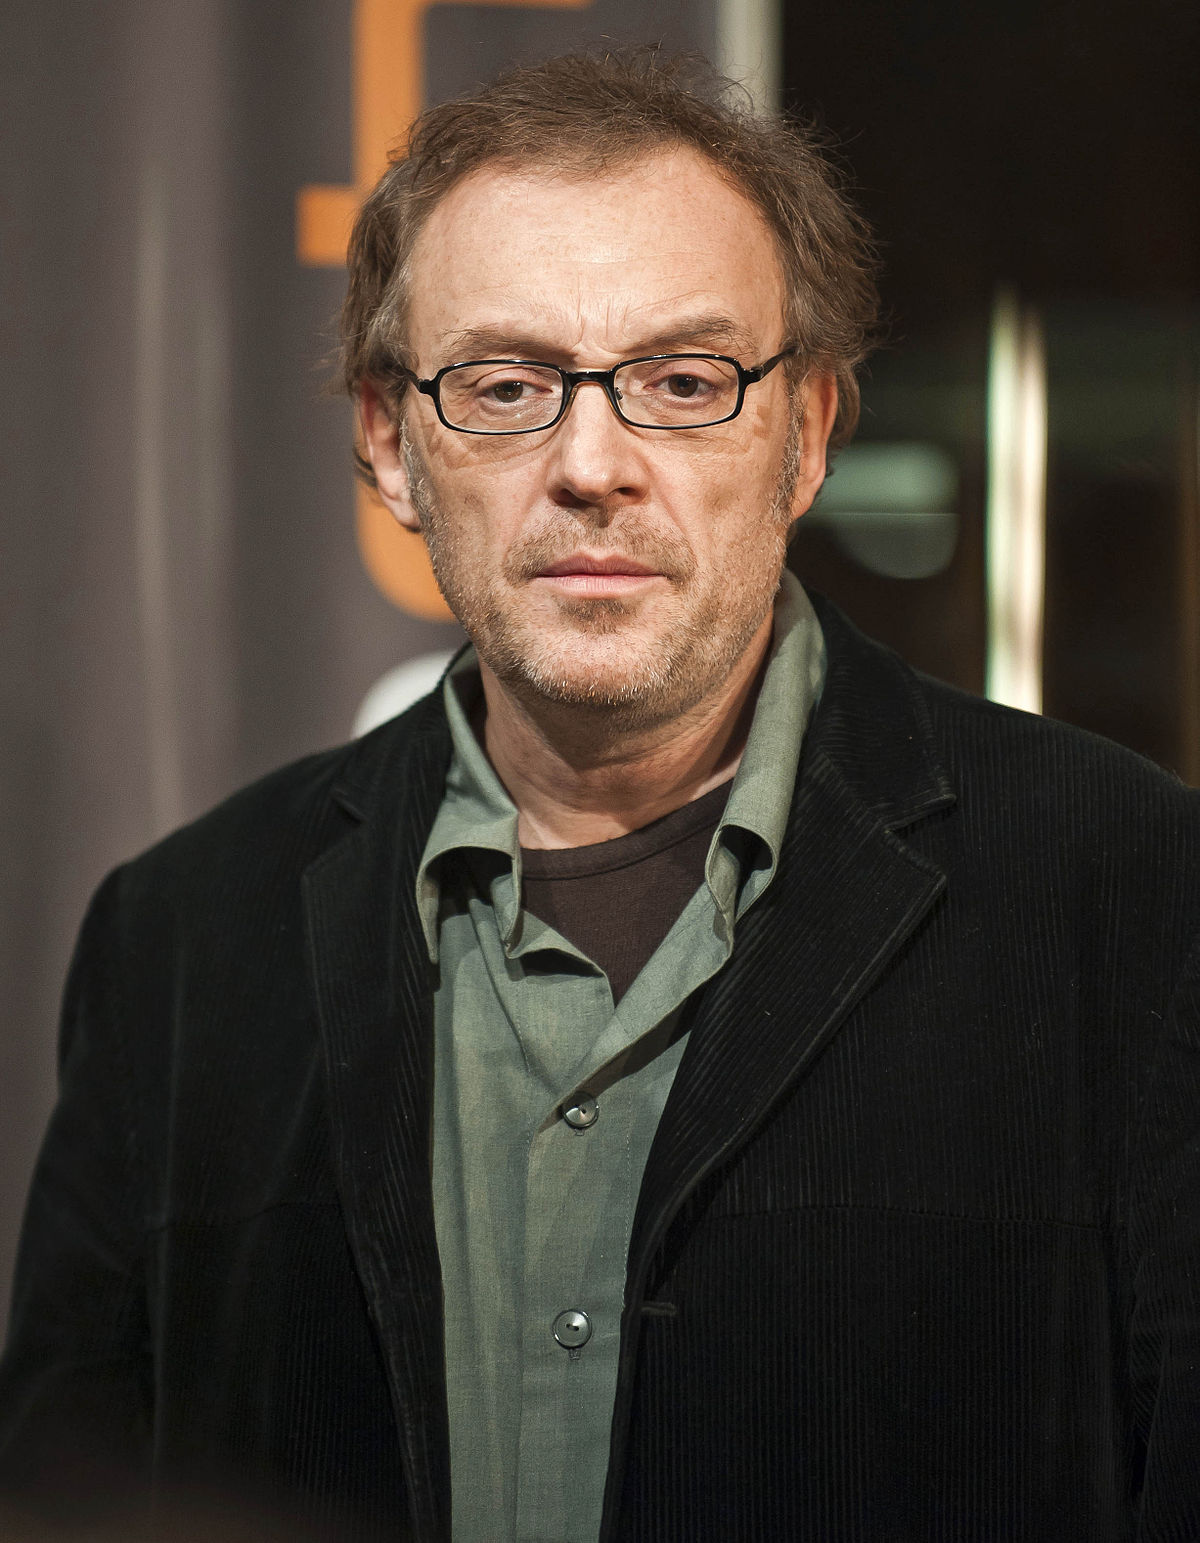 Josef Harder